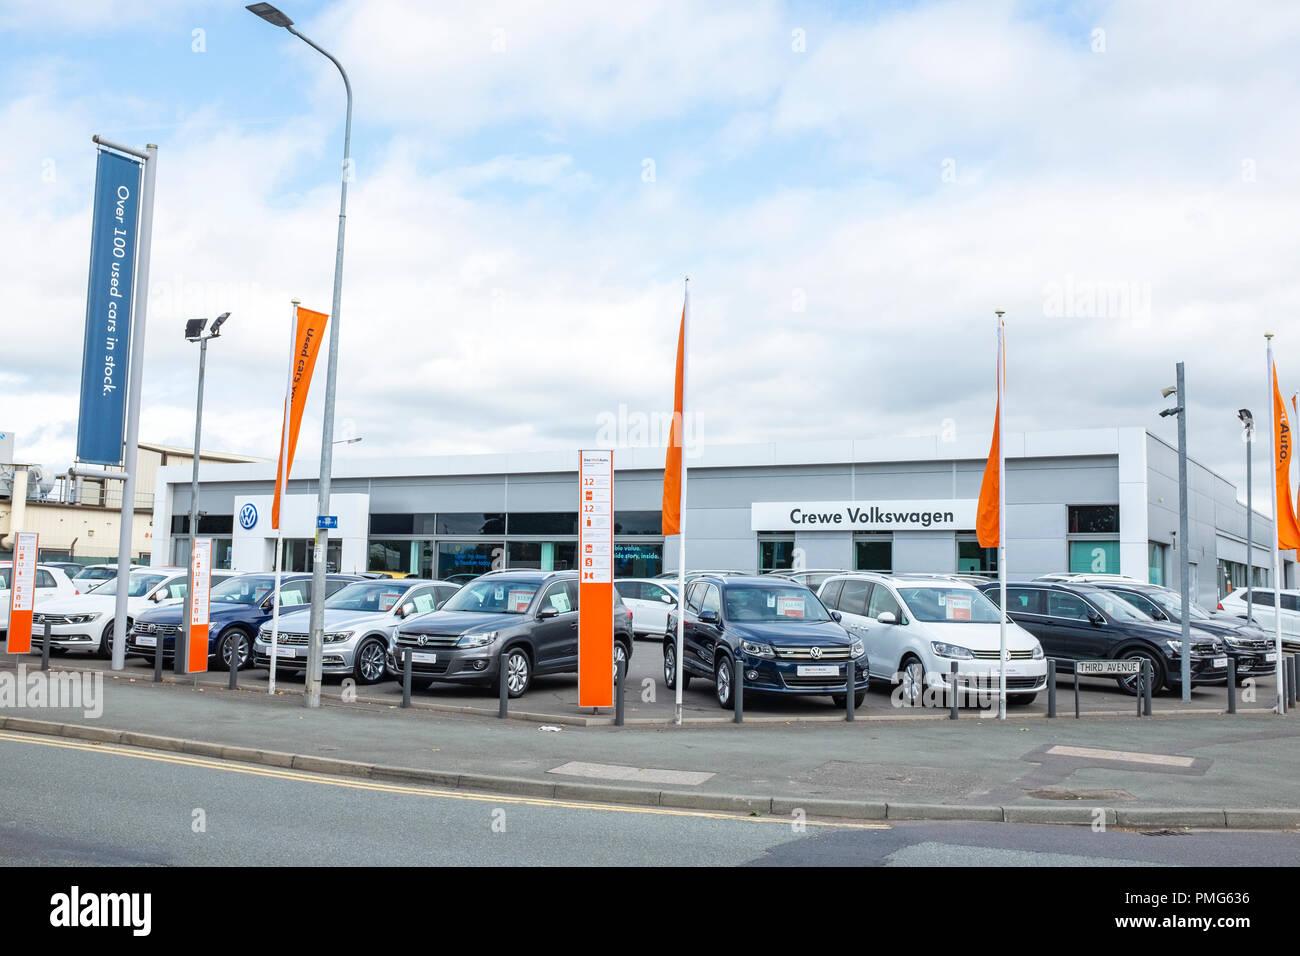 Crewe volkswagon dealer Cheshire UK - Stock Image